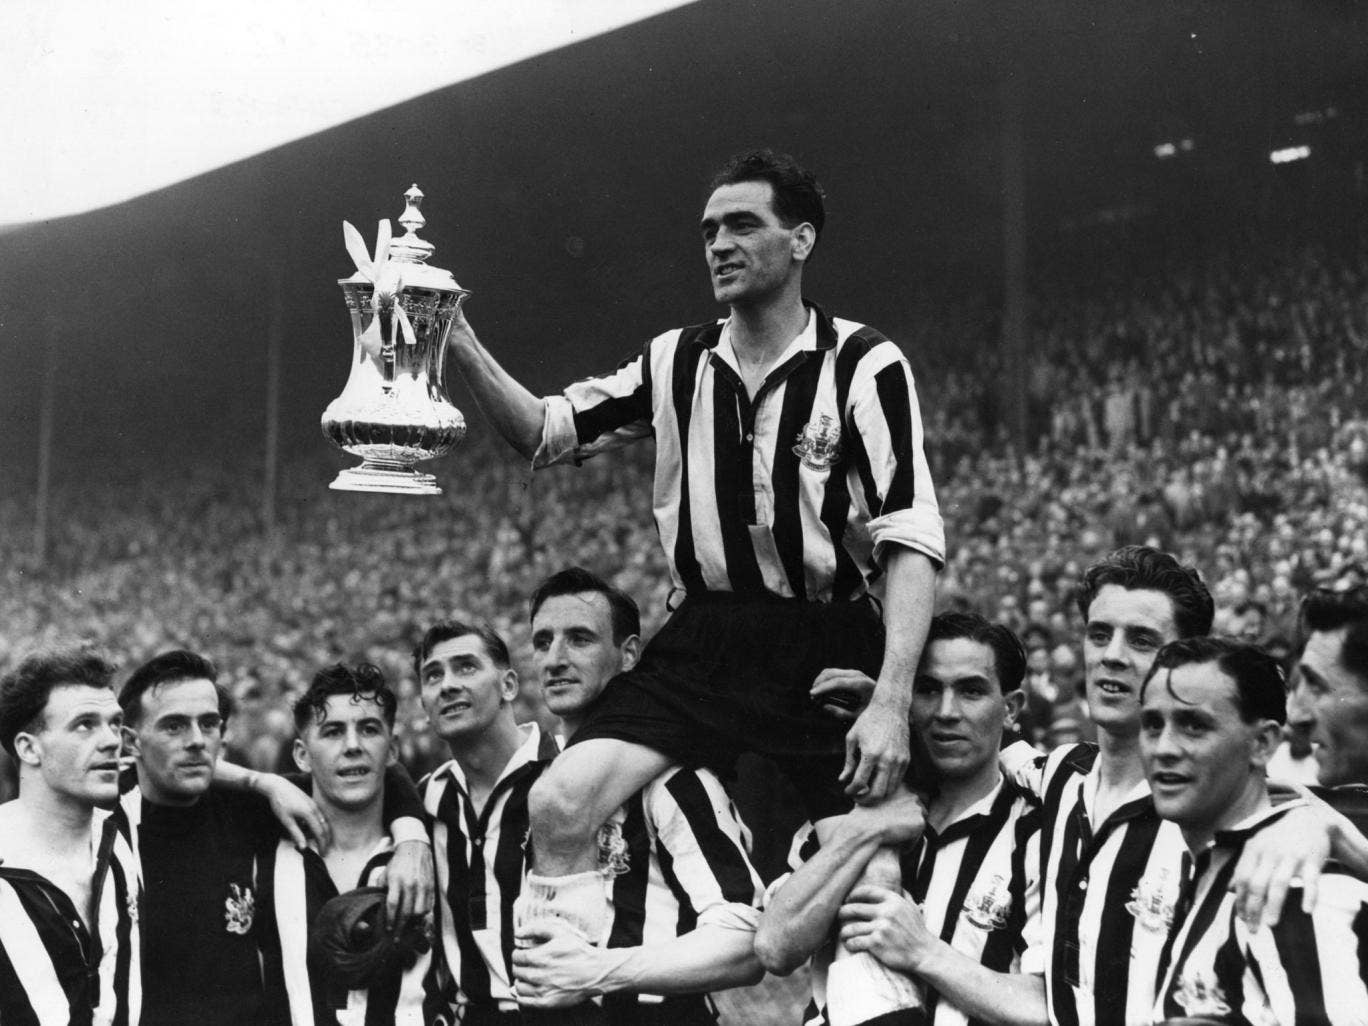 Newcastle United's captain Joe Harvey raises the FA Cup at Wembley in 1952